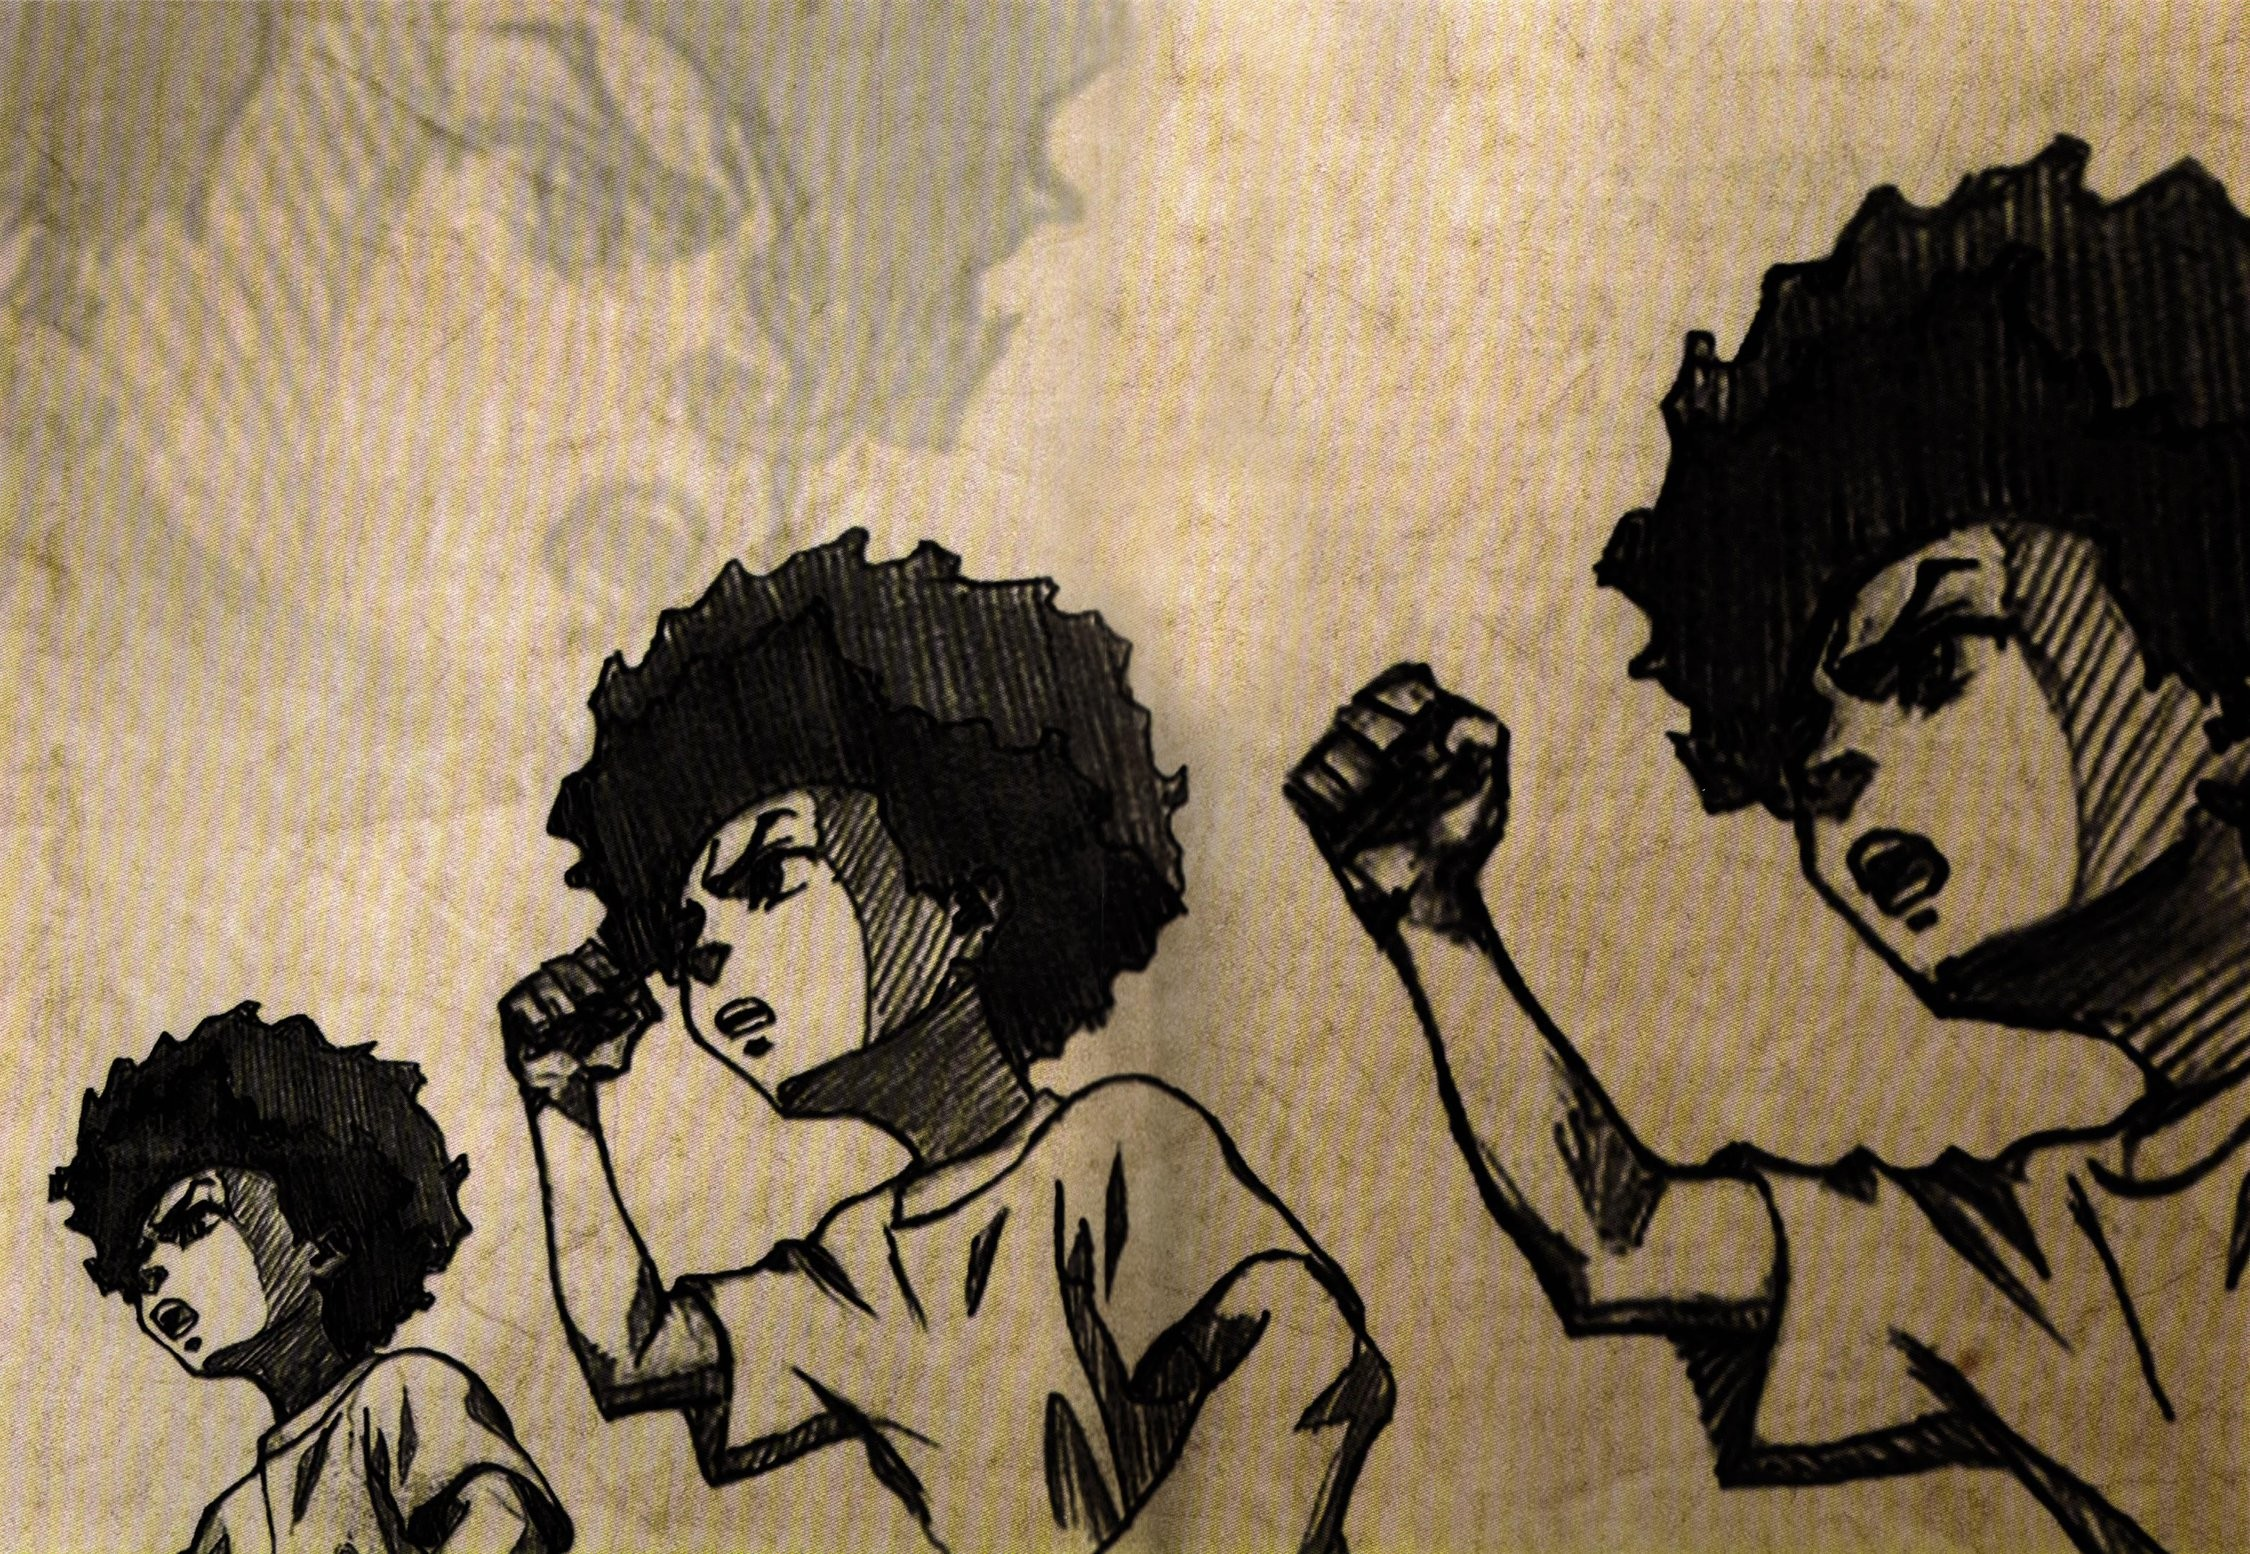 Res: 2250x1554, The Boondocks Wallpaper - Huey Freeman by Razpootin ...